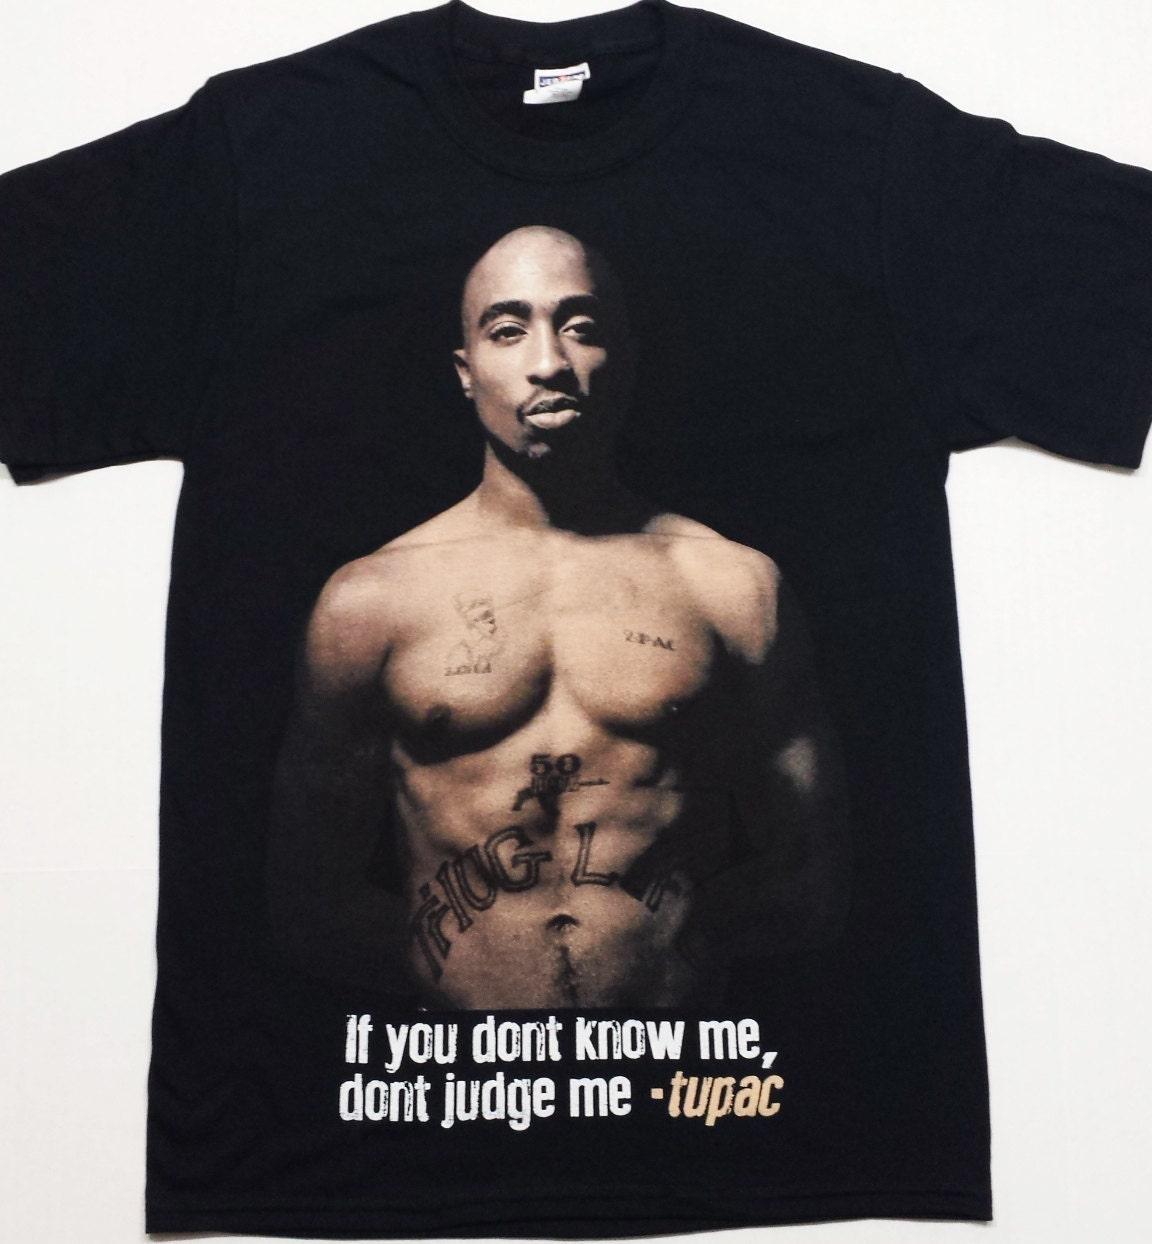 tupac 2pac shakur thug life t shirts dope swag drake by. Black Bedroom Furniture Sets. Home Design Ideas